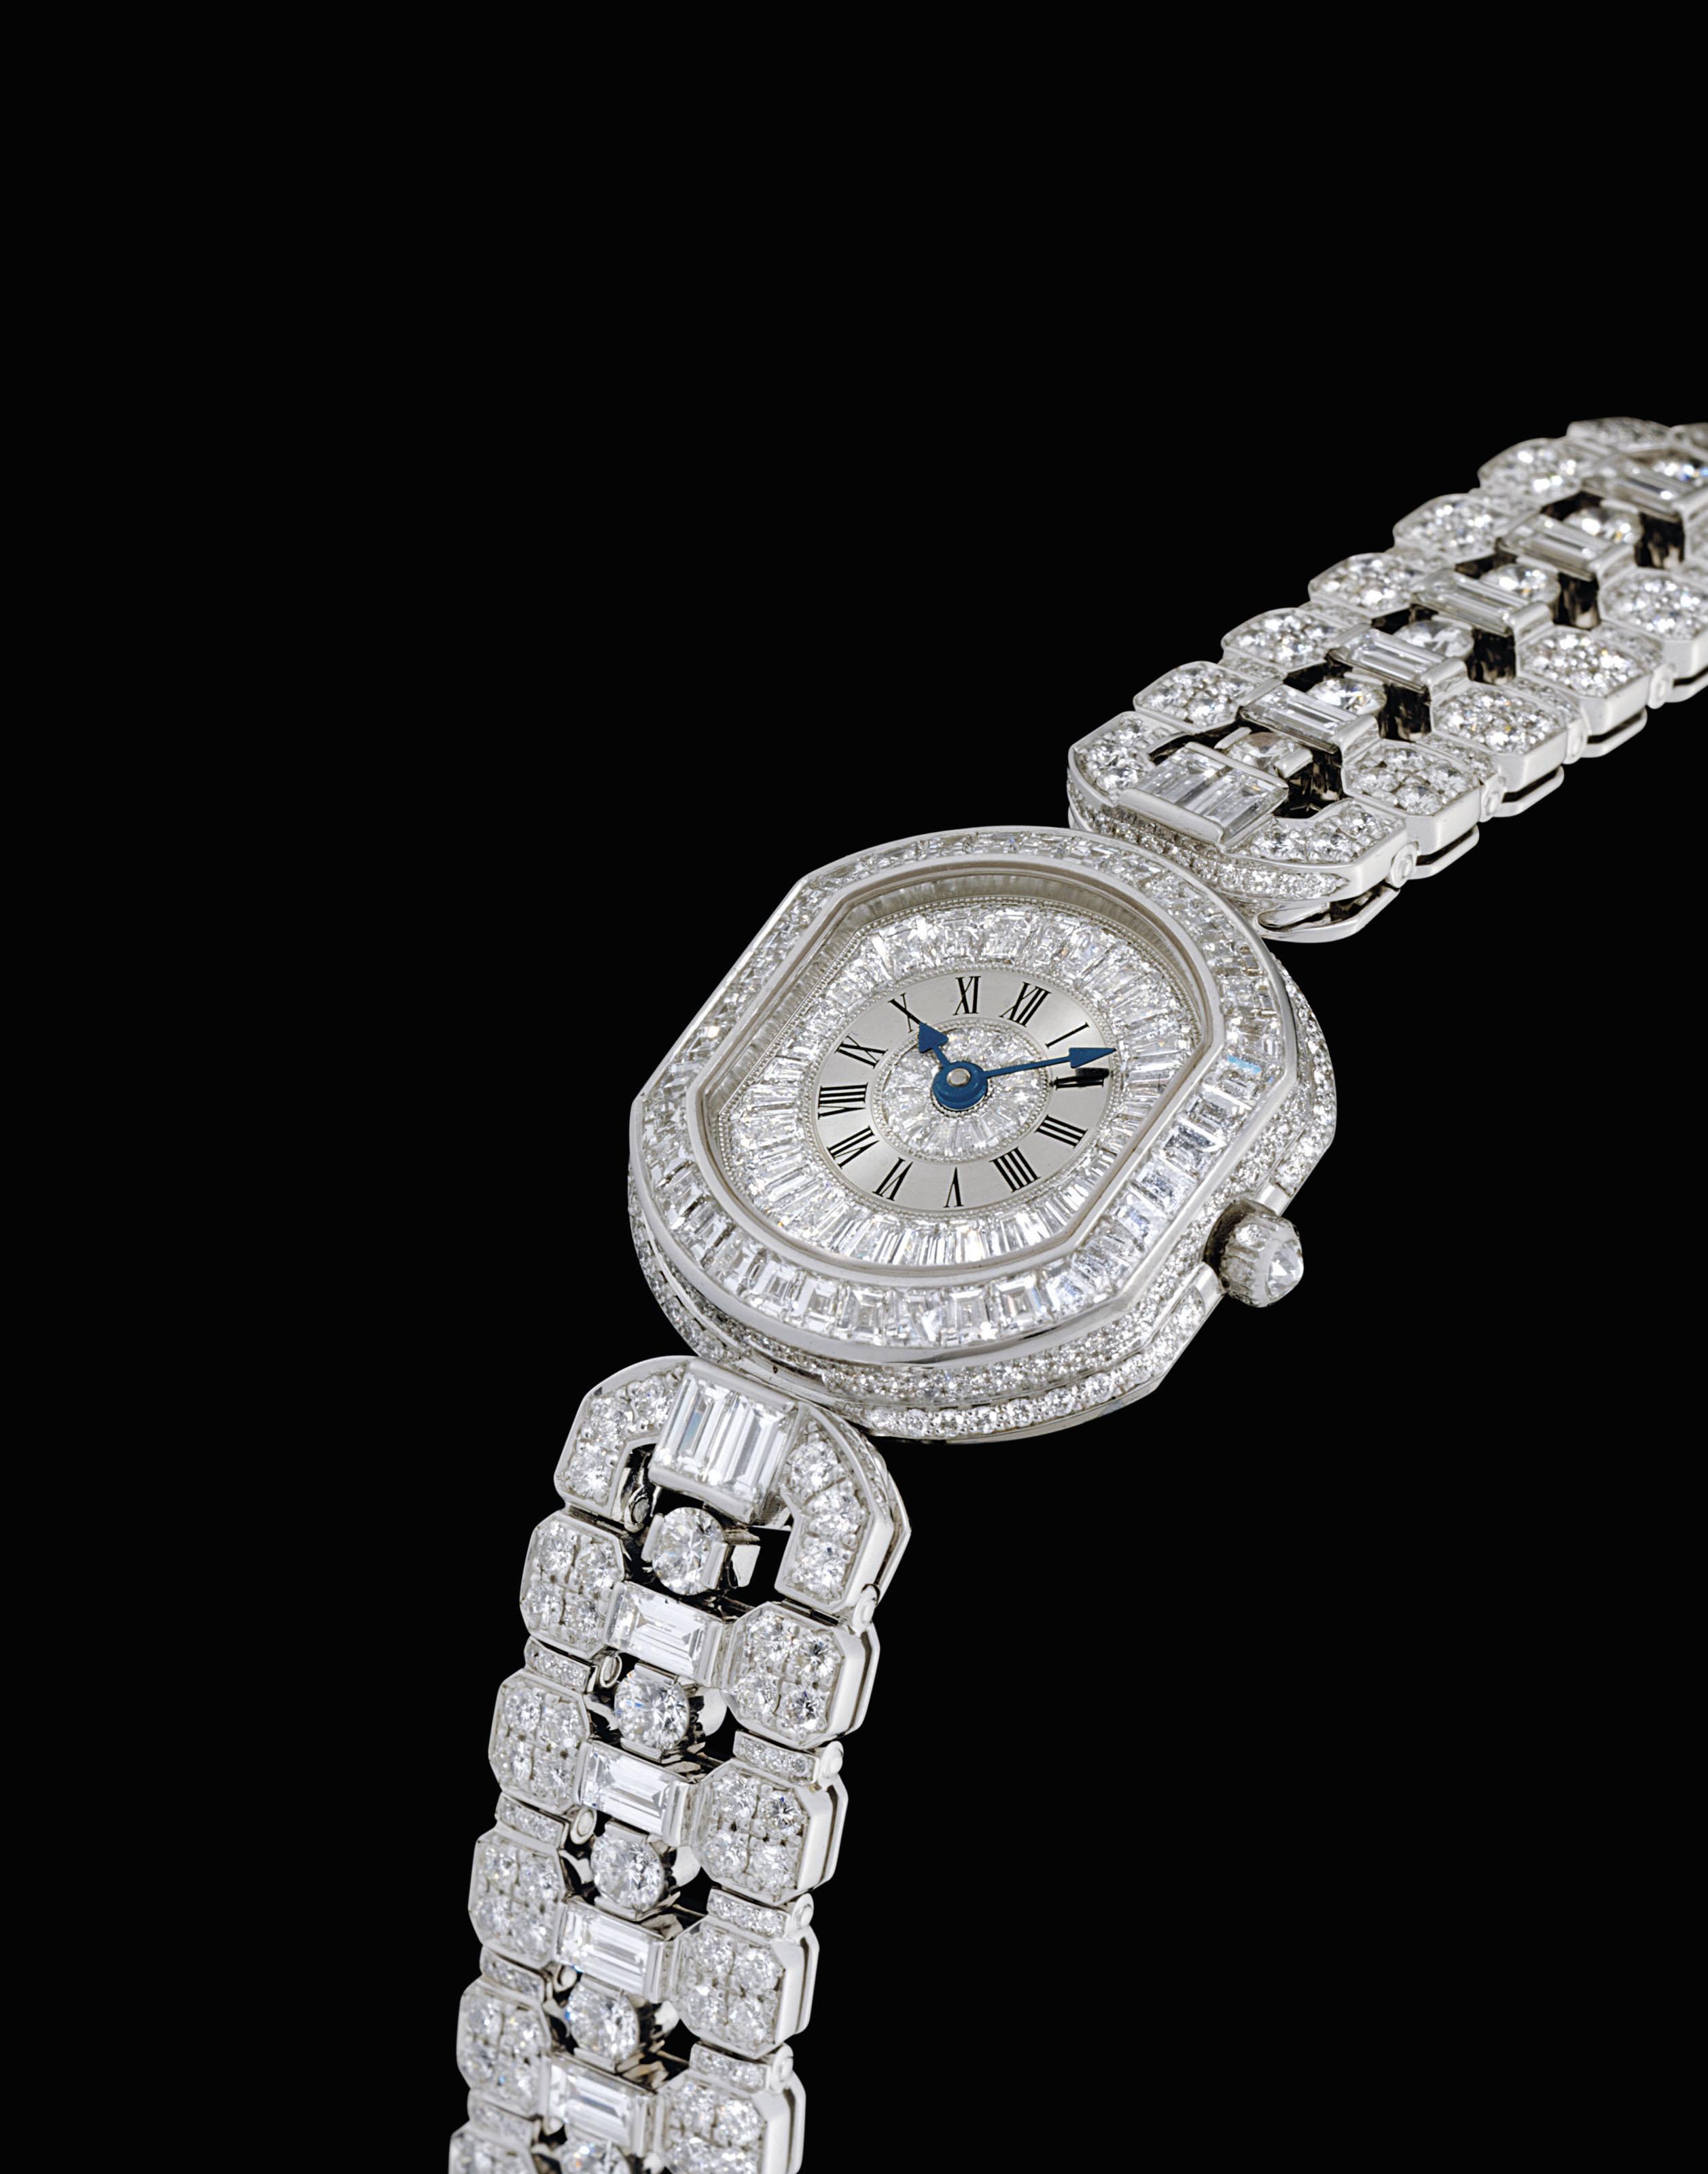 DANIEL ROTH. A LADY'S IMPRESSIVE AND VERY RARE 18K WHITE GOLD AND DIAMOND-SET BRACELET WATCH